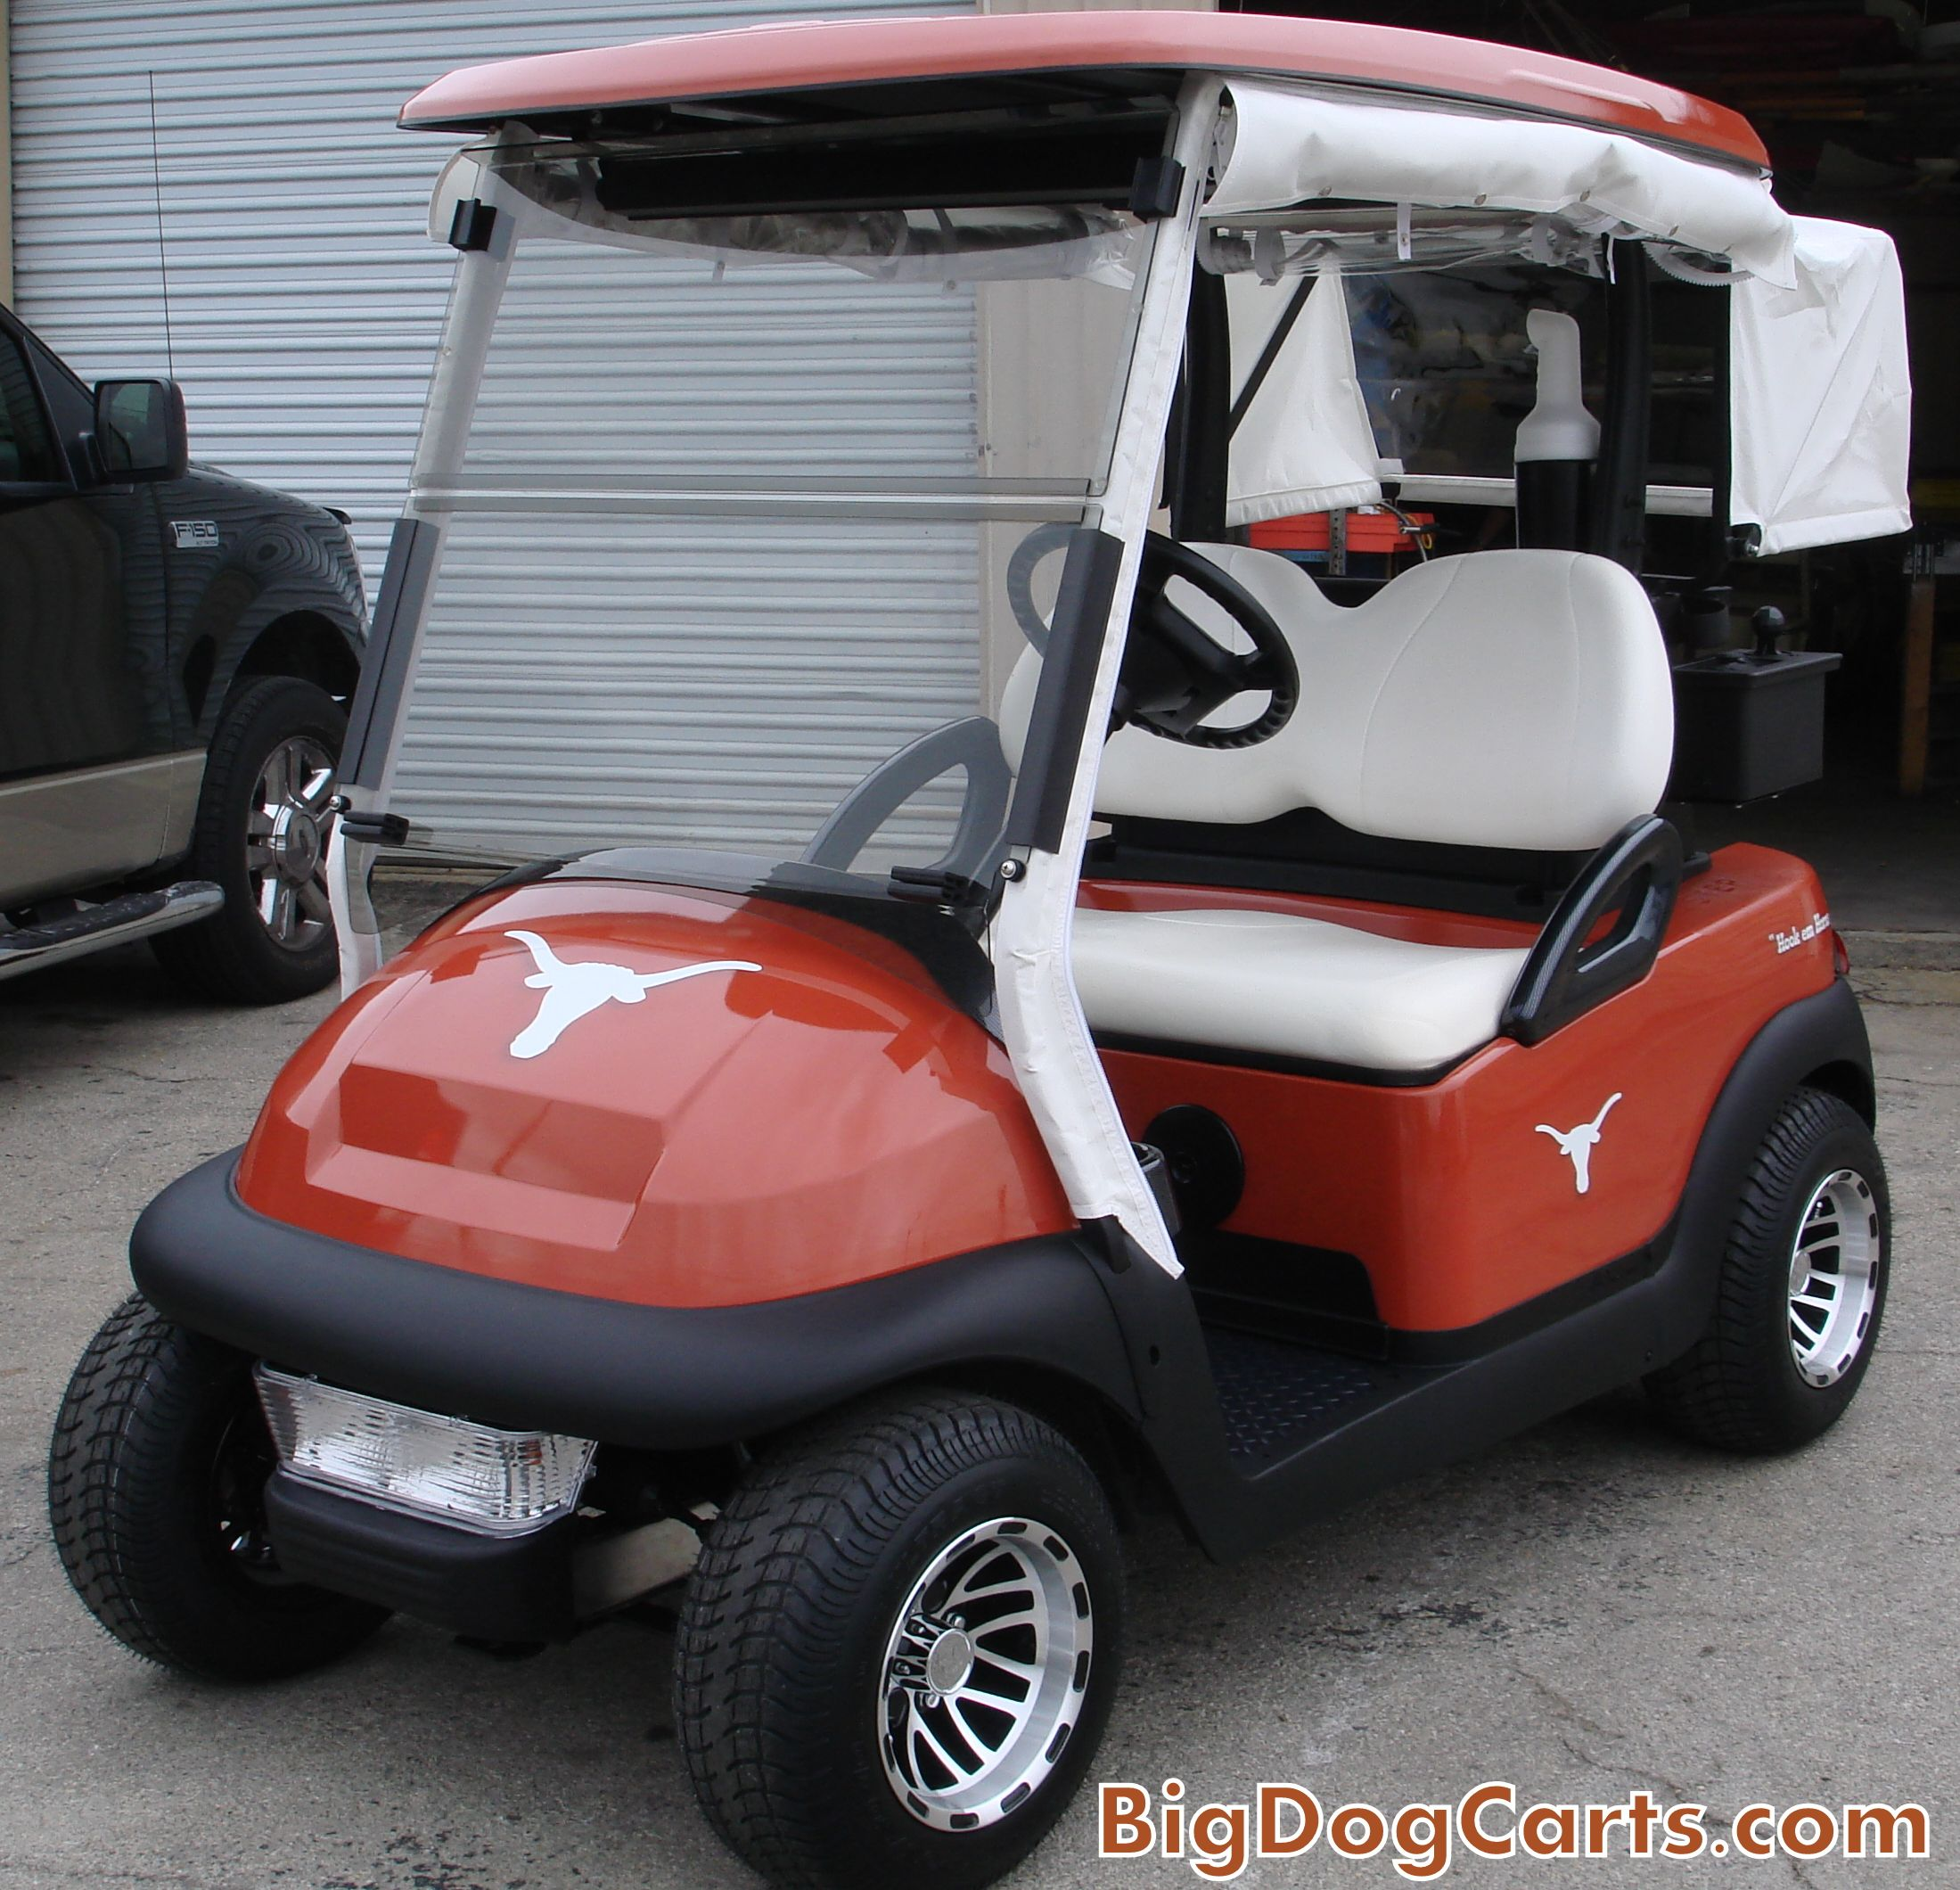 Bigdog Custom Golf Carts Custom golf carts, Golf carts, Golf